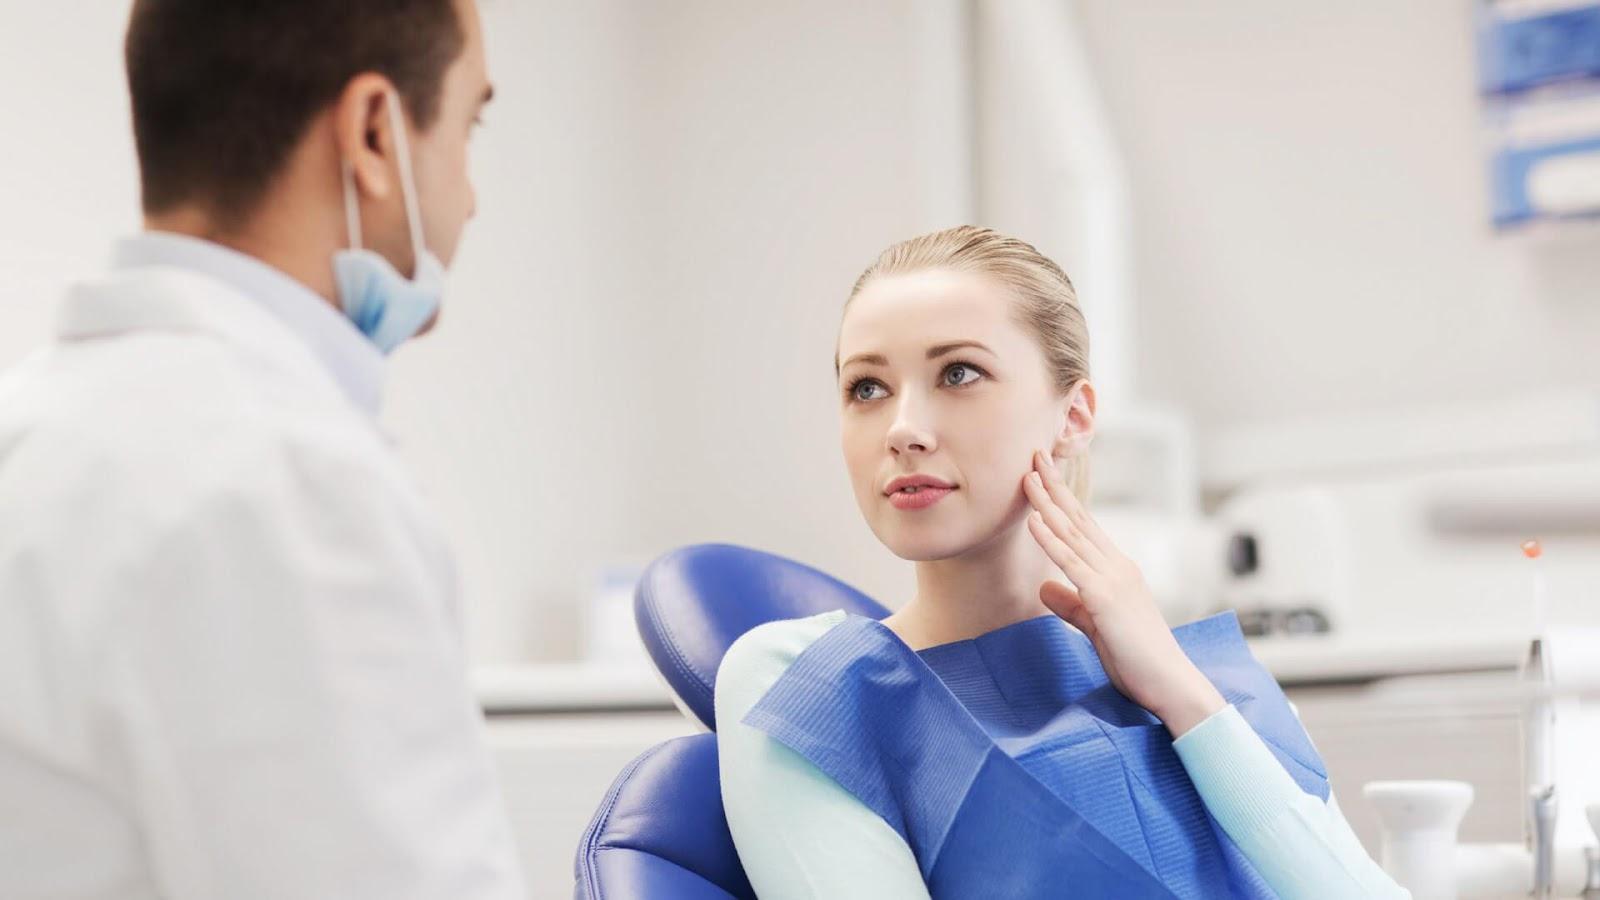 C:\Users\PC\Downloads\woman-in-a-dentist-office.jpg